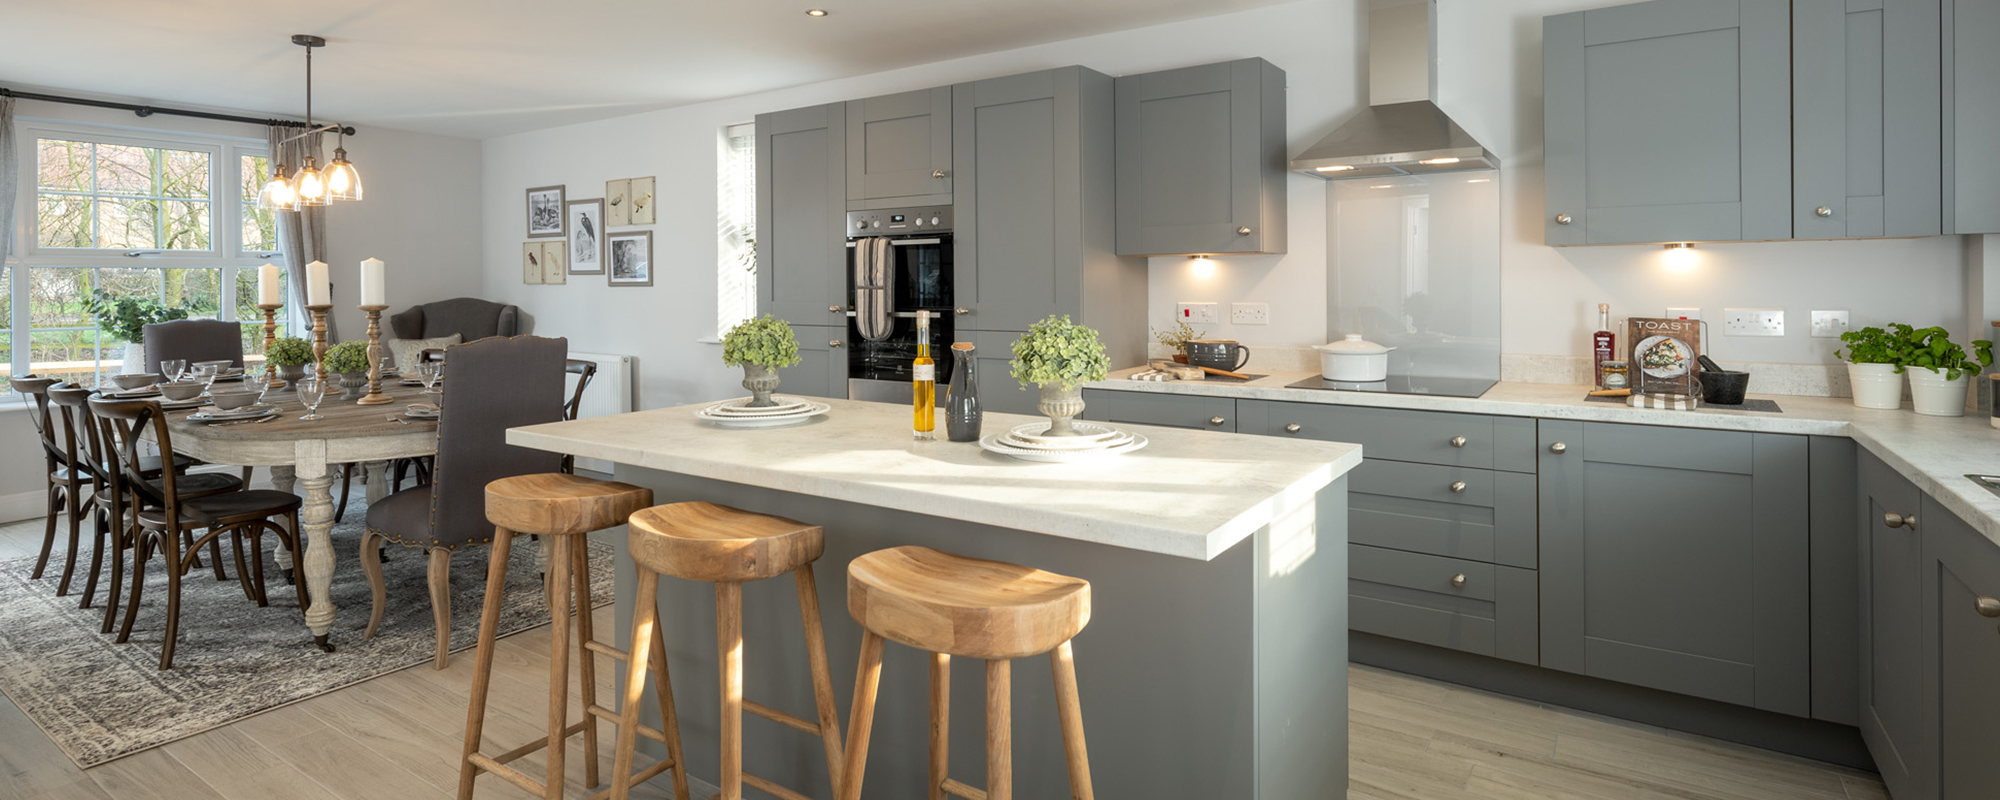 Mulgrave Properties kitchen dining area